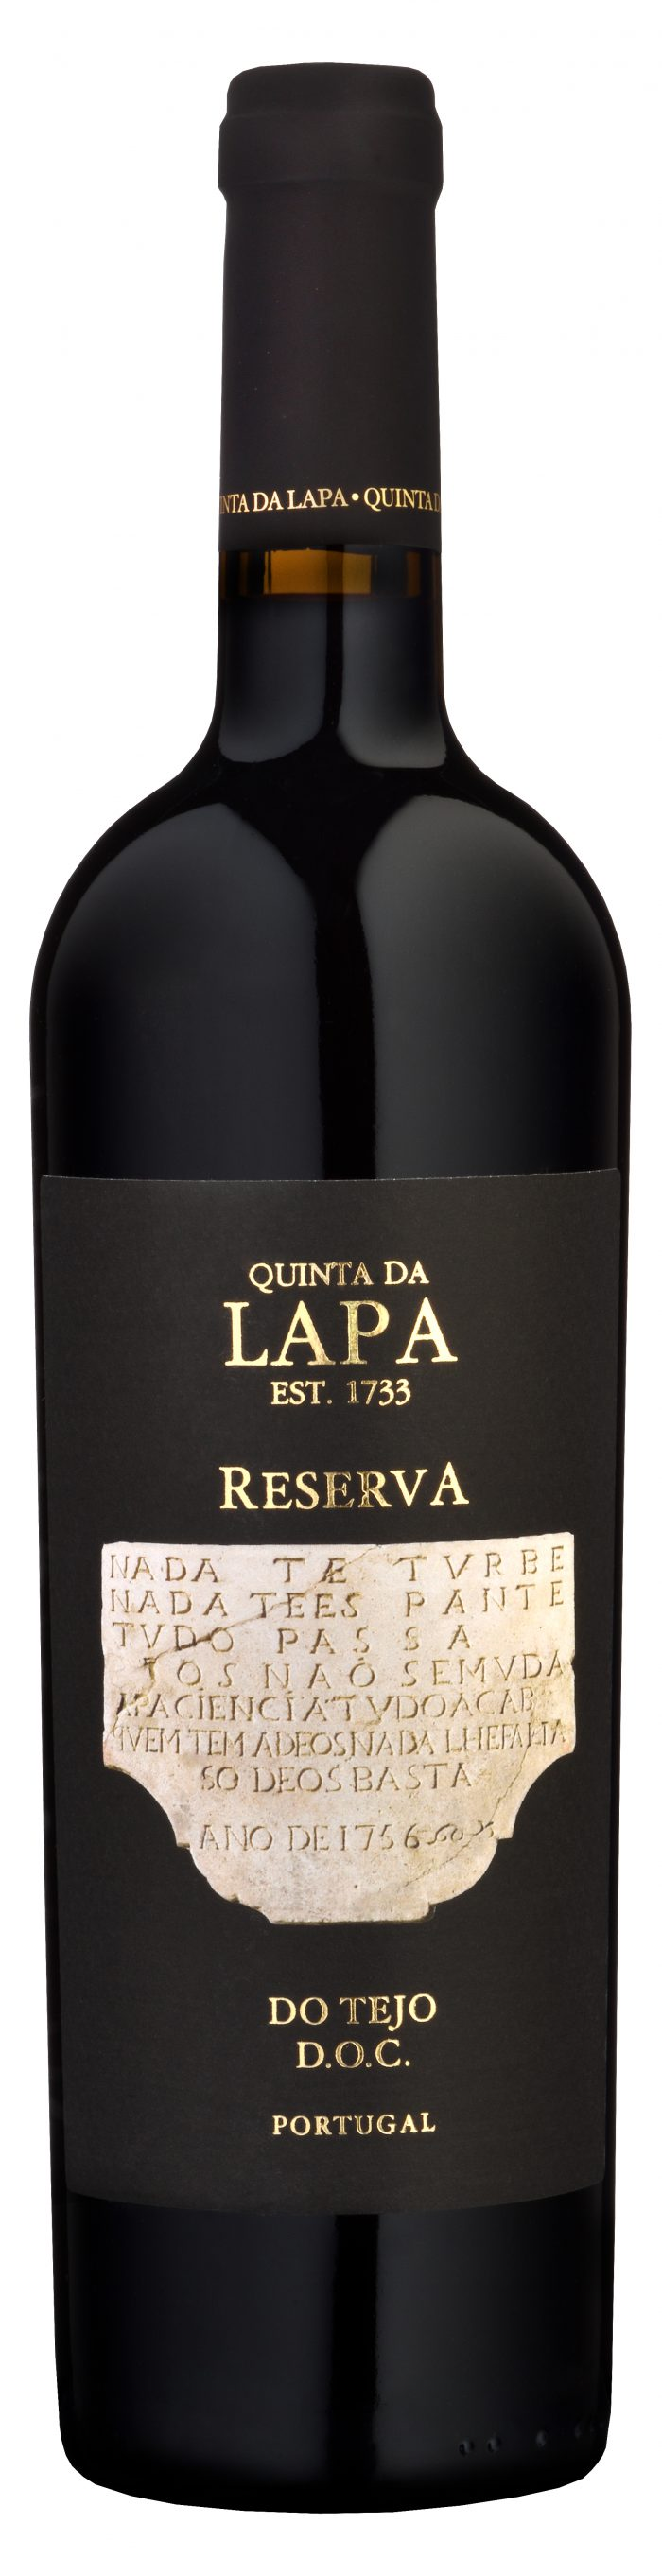 Quinta da Lapa Reserva Tinto | Portugal | gemaakt van de druif: Cabernet Sauvignon, Merlot, Syrah, Touriga Nacional